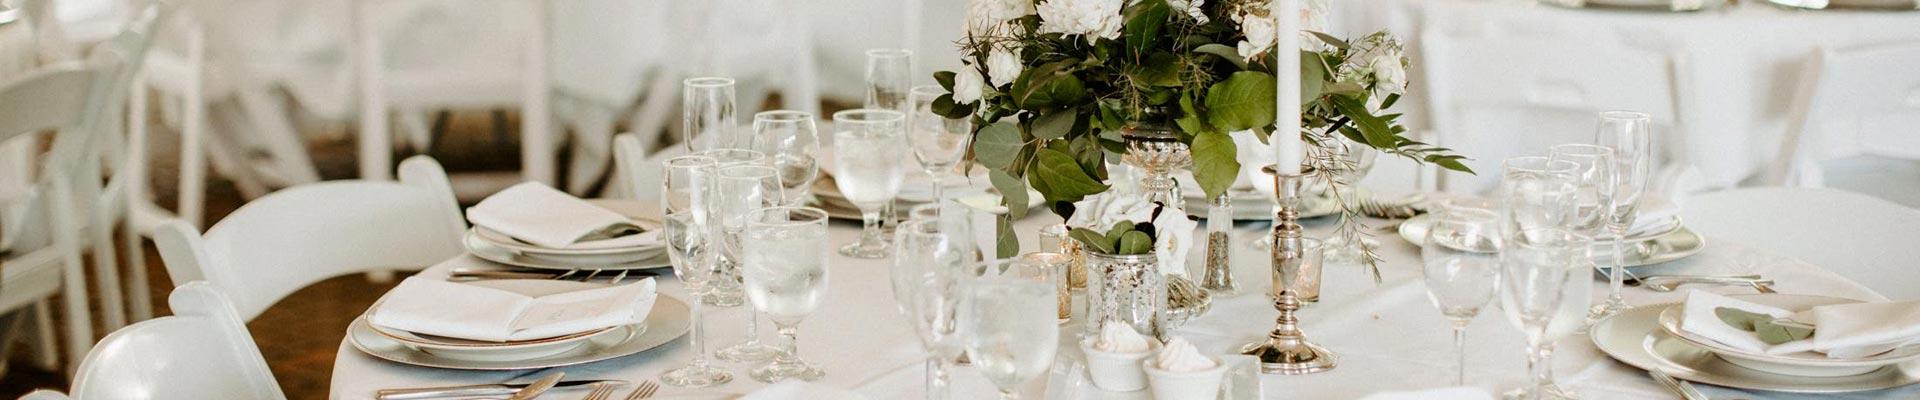 Shadow Lake Weddings Wedding Venues Rochester Ny Wedding